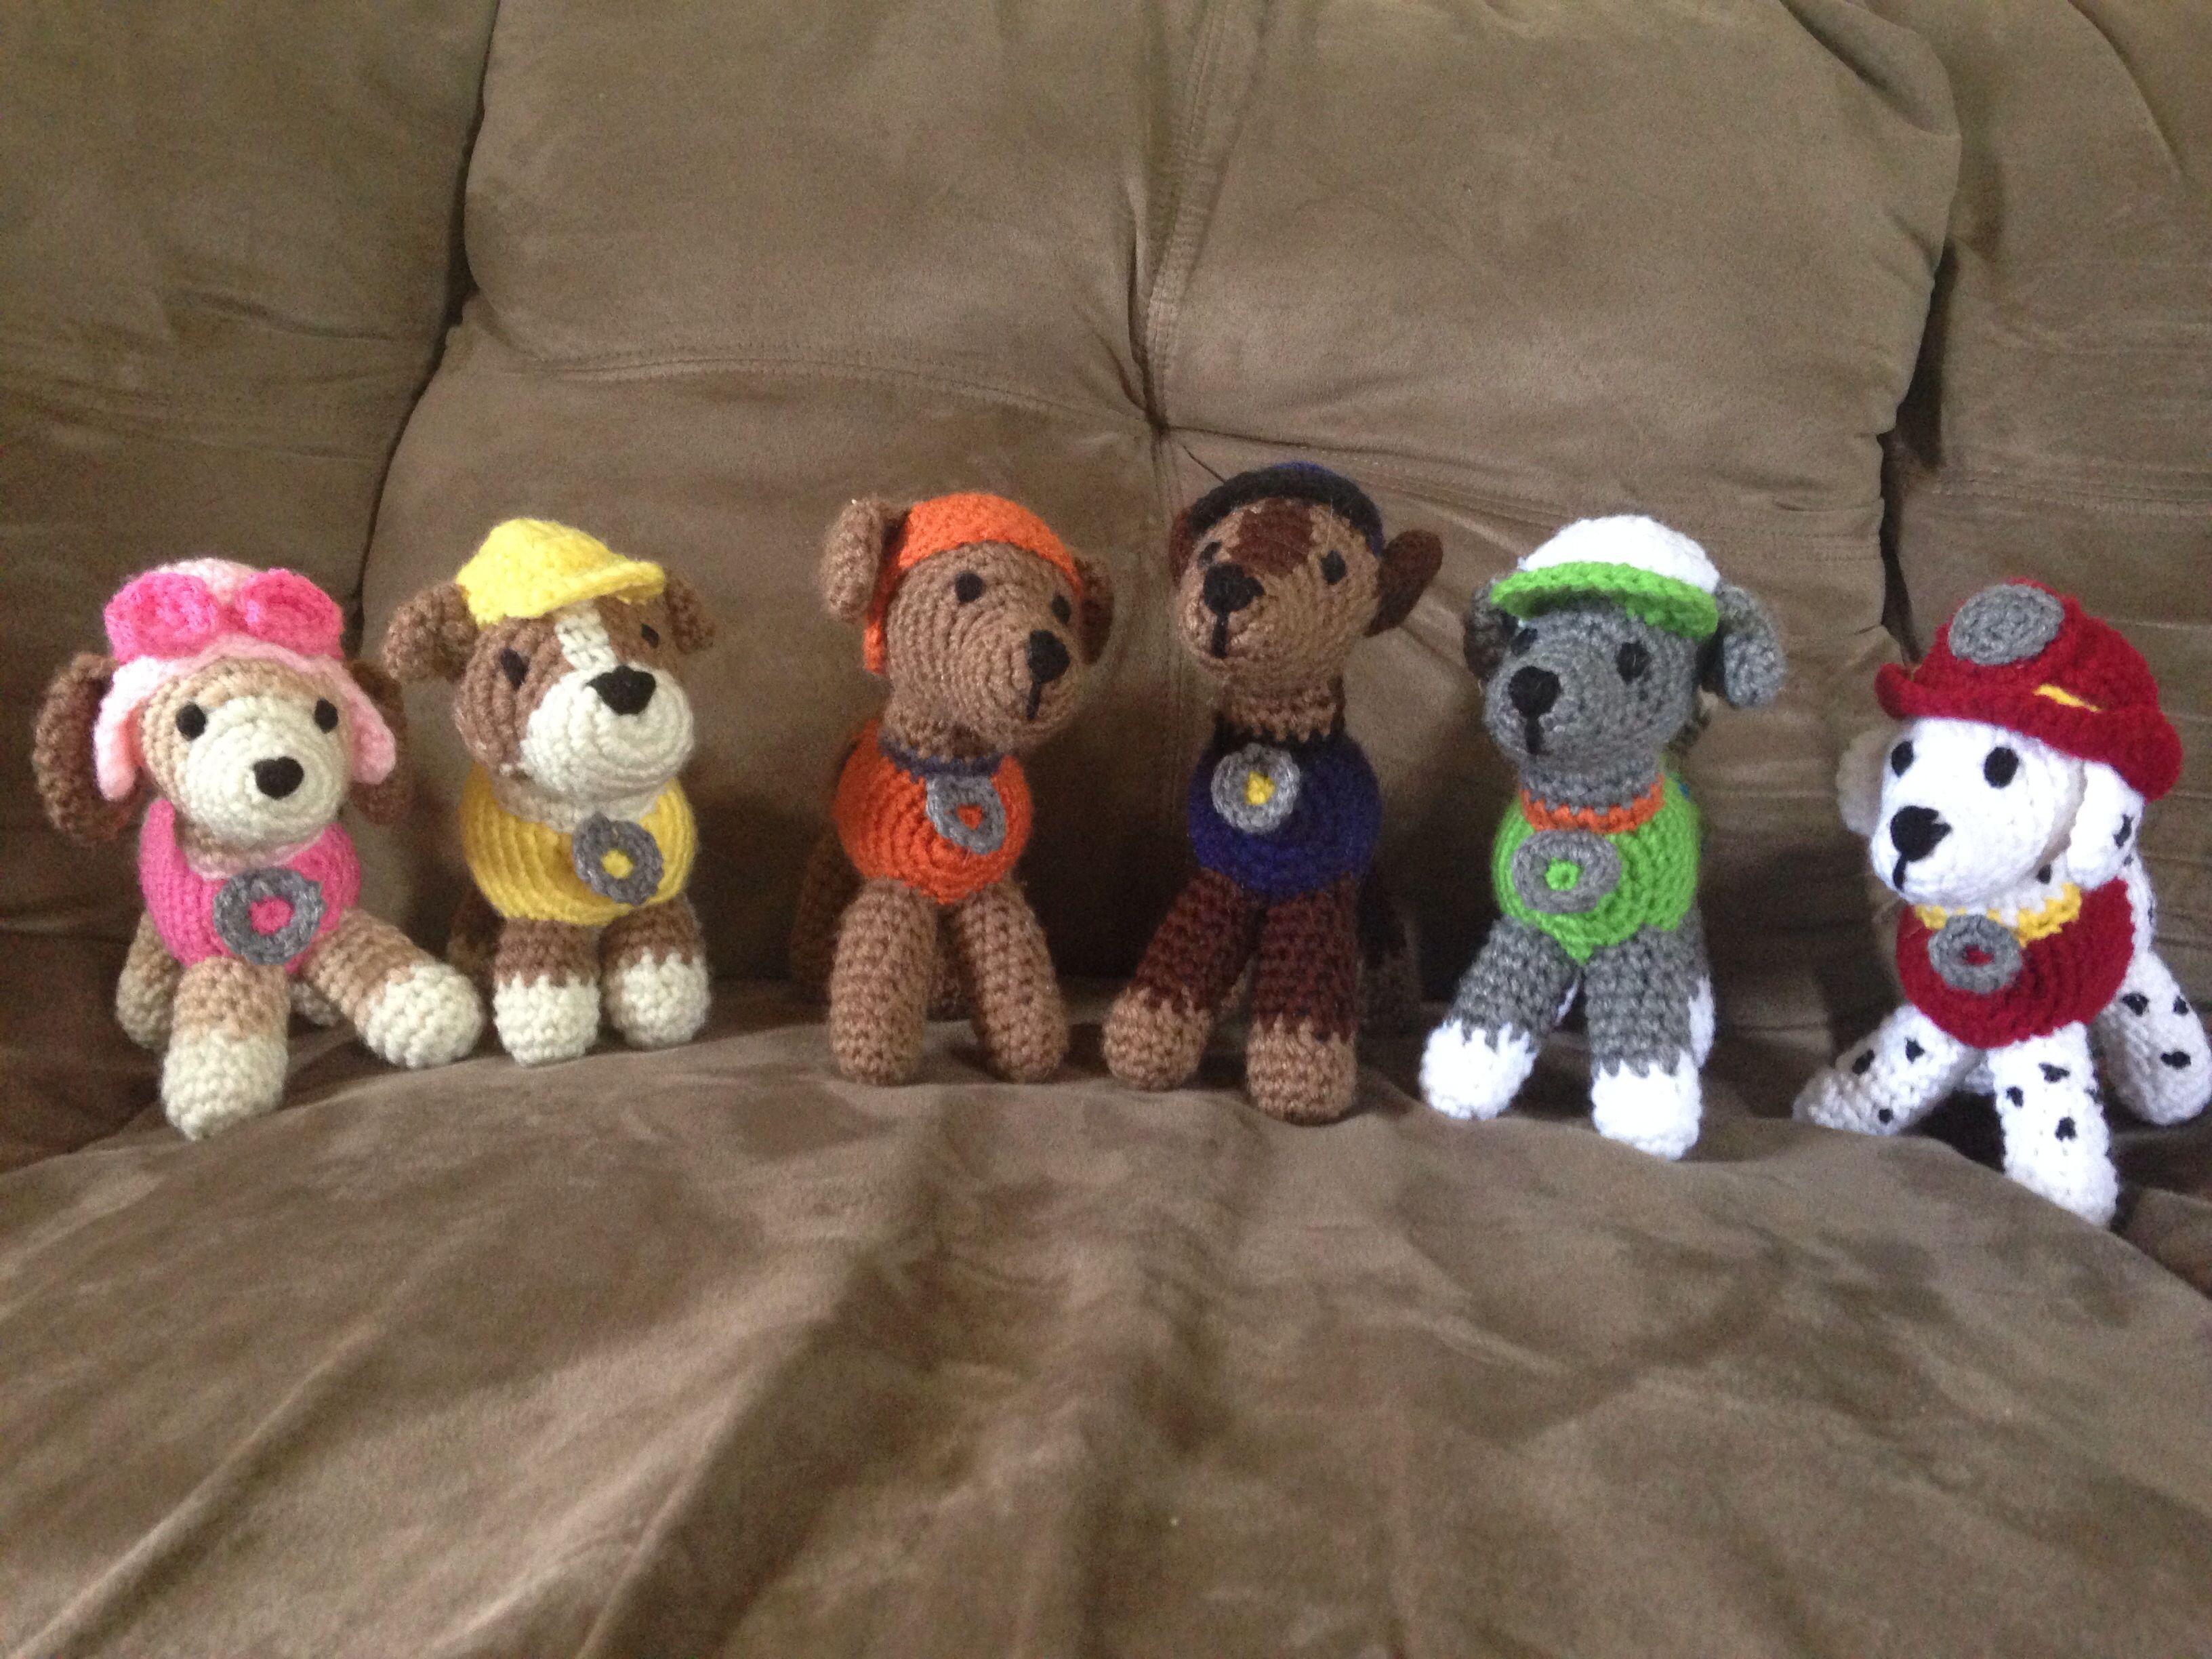 Cute Amigurumi Knitting Patterns : Crochet amigurumi paw patrol puppies holly s hooks